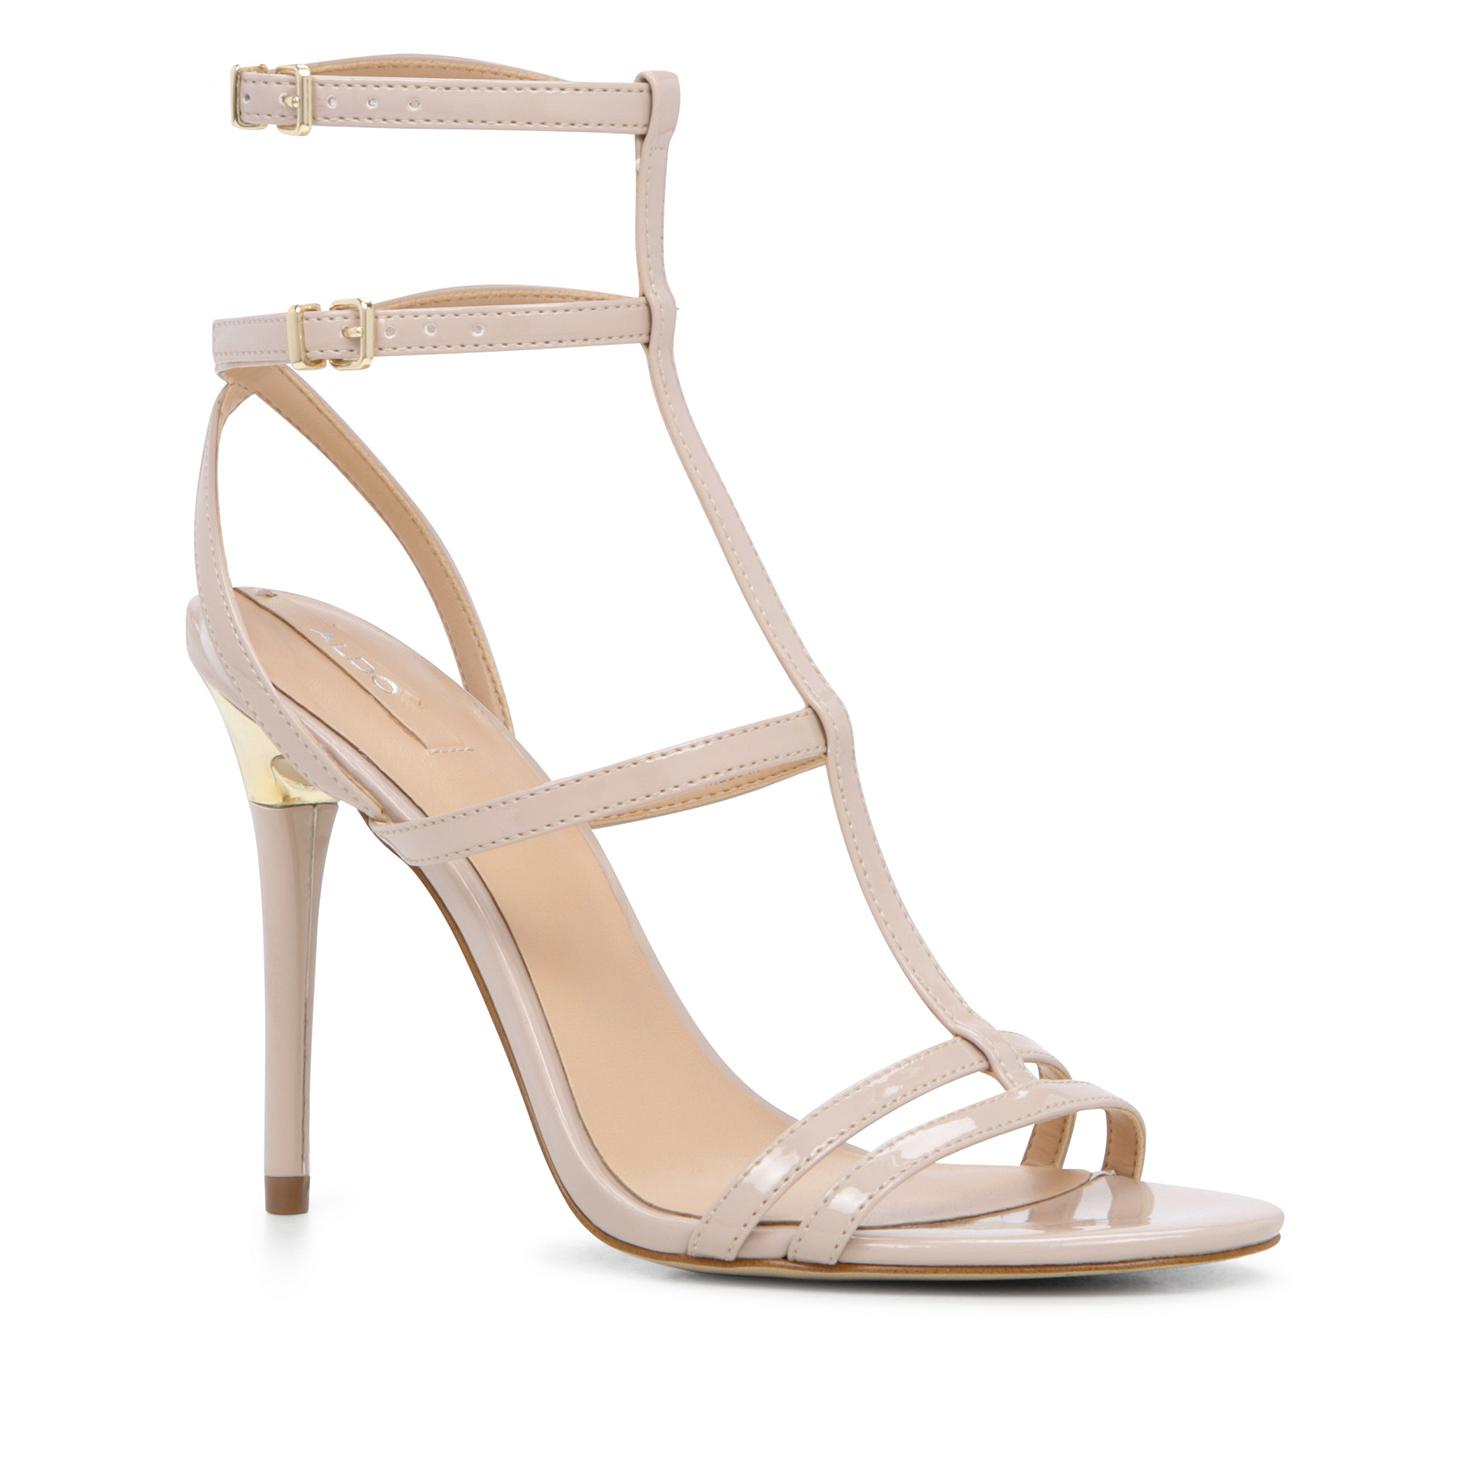 Aldo Shoes Sale Indonesia